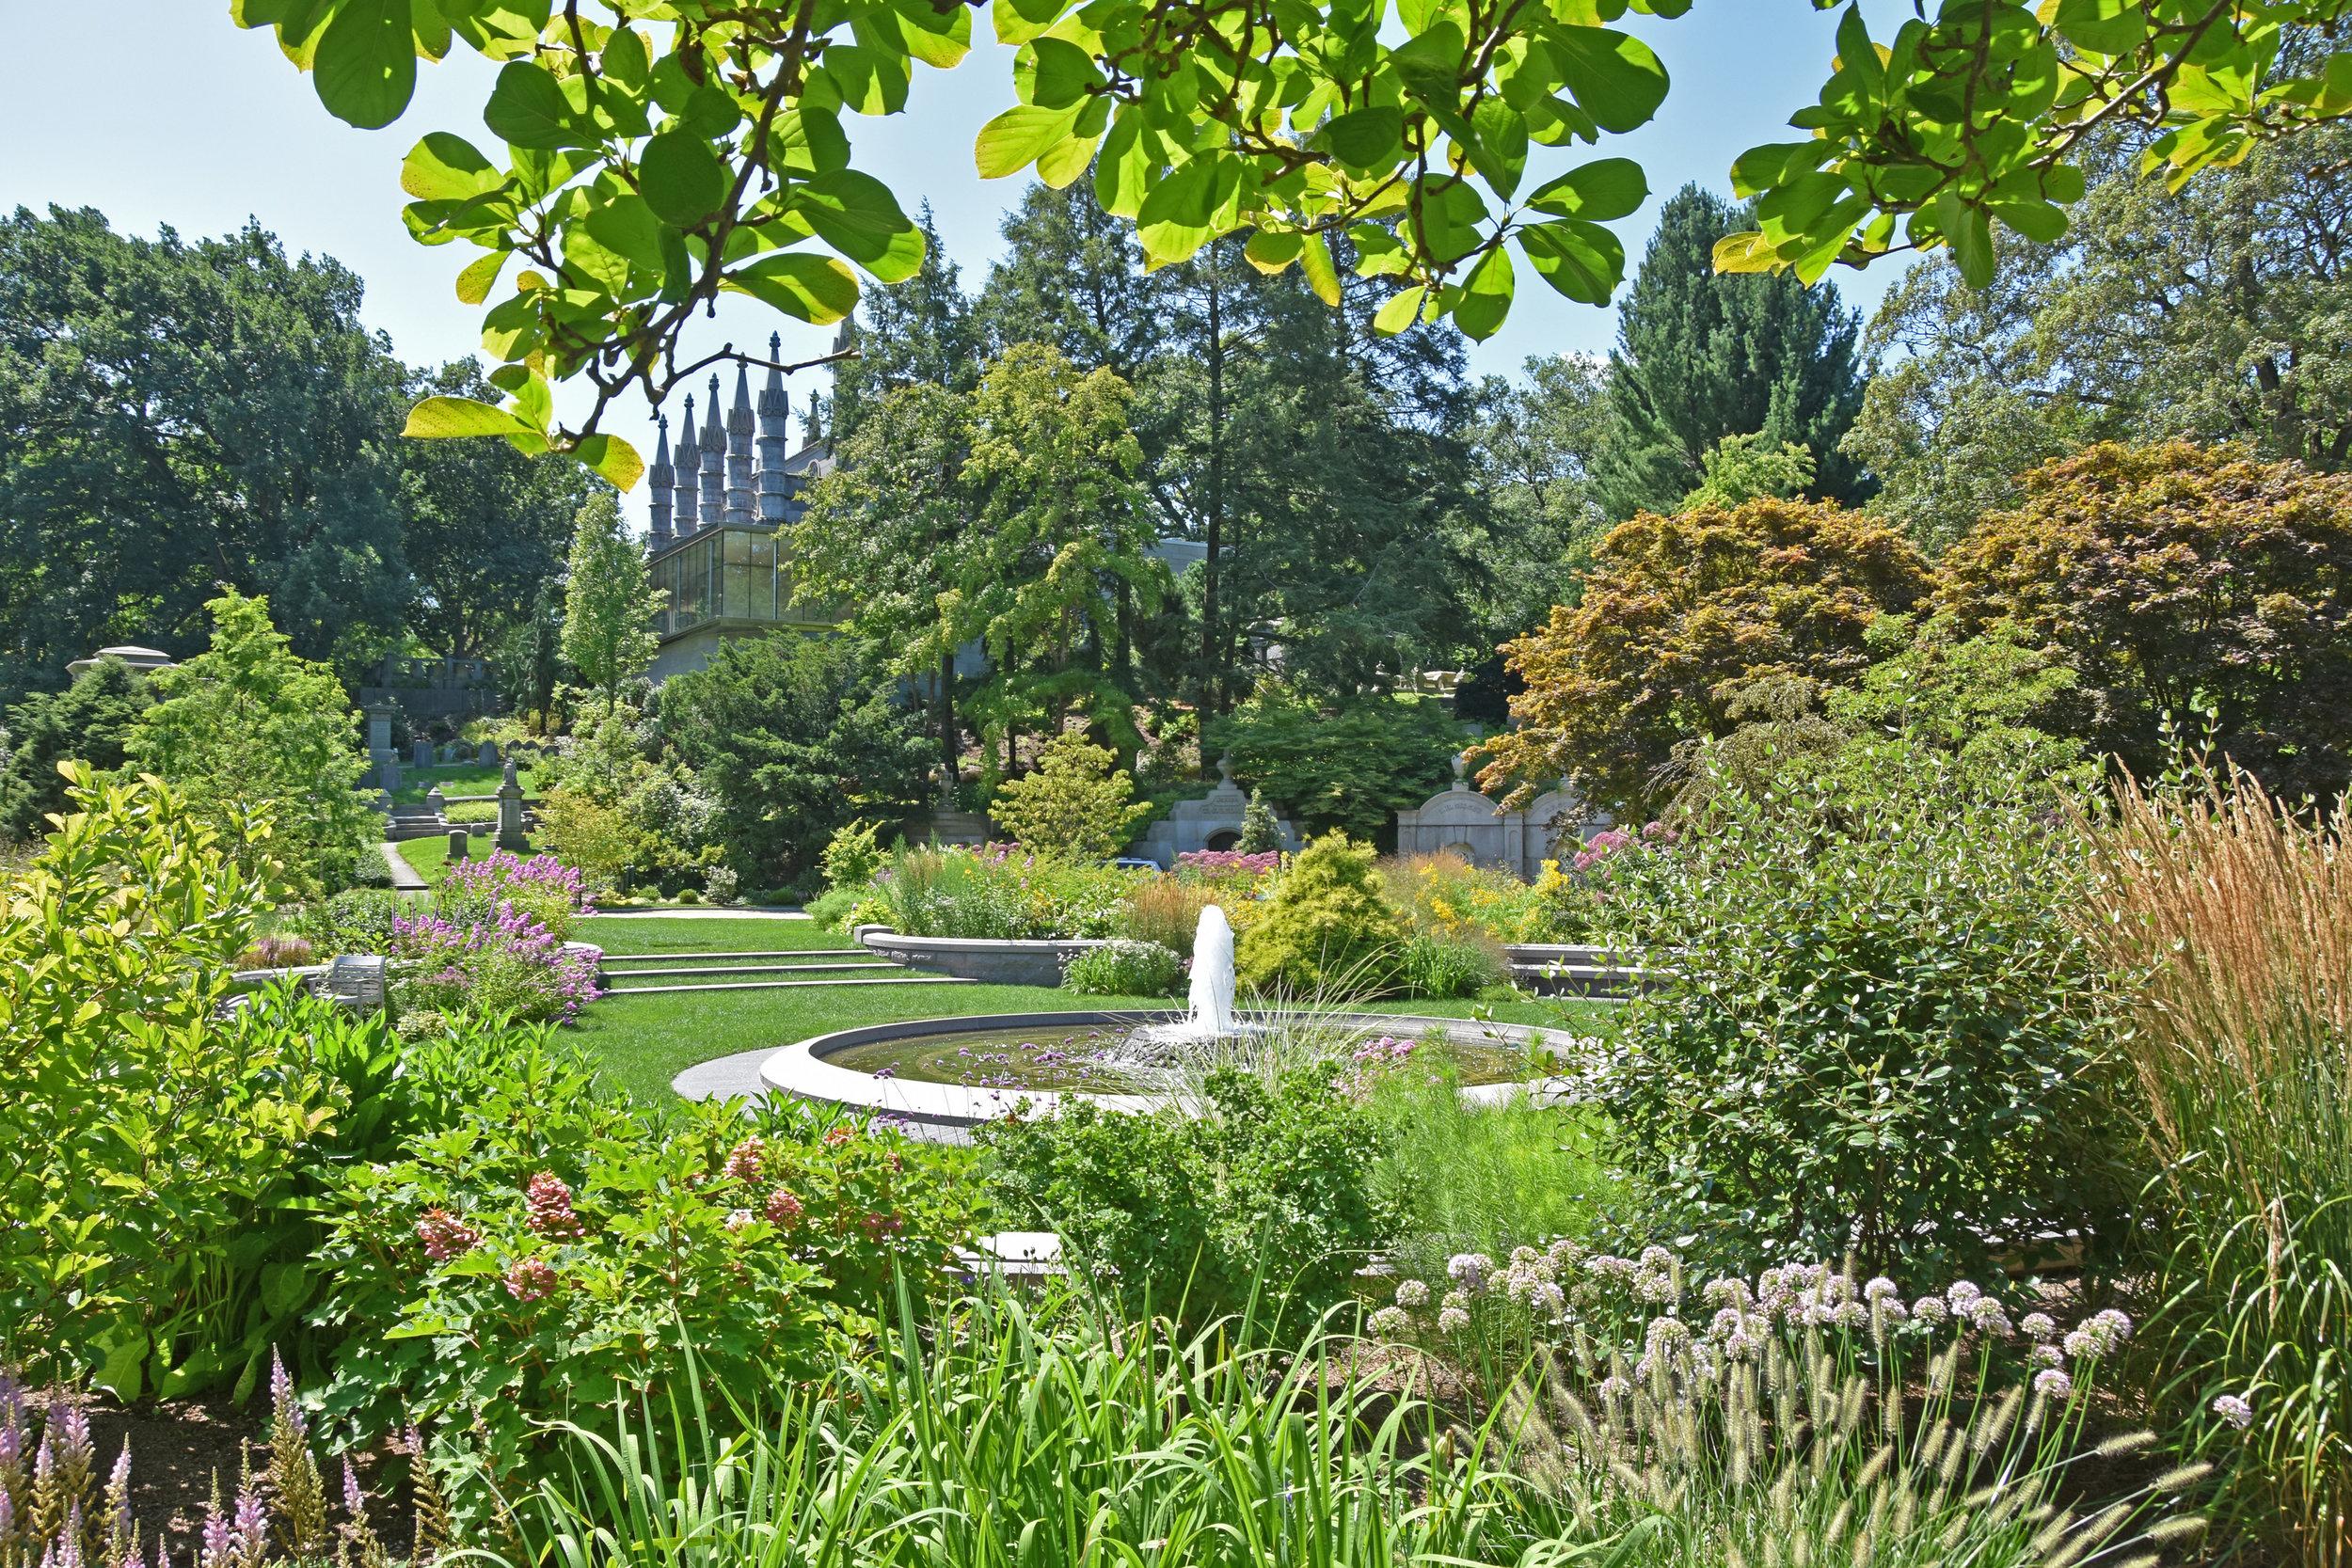 Landscape Planning for Cemeteries